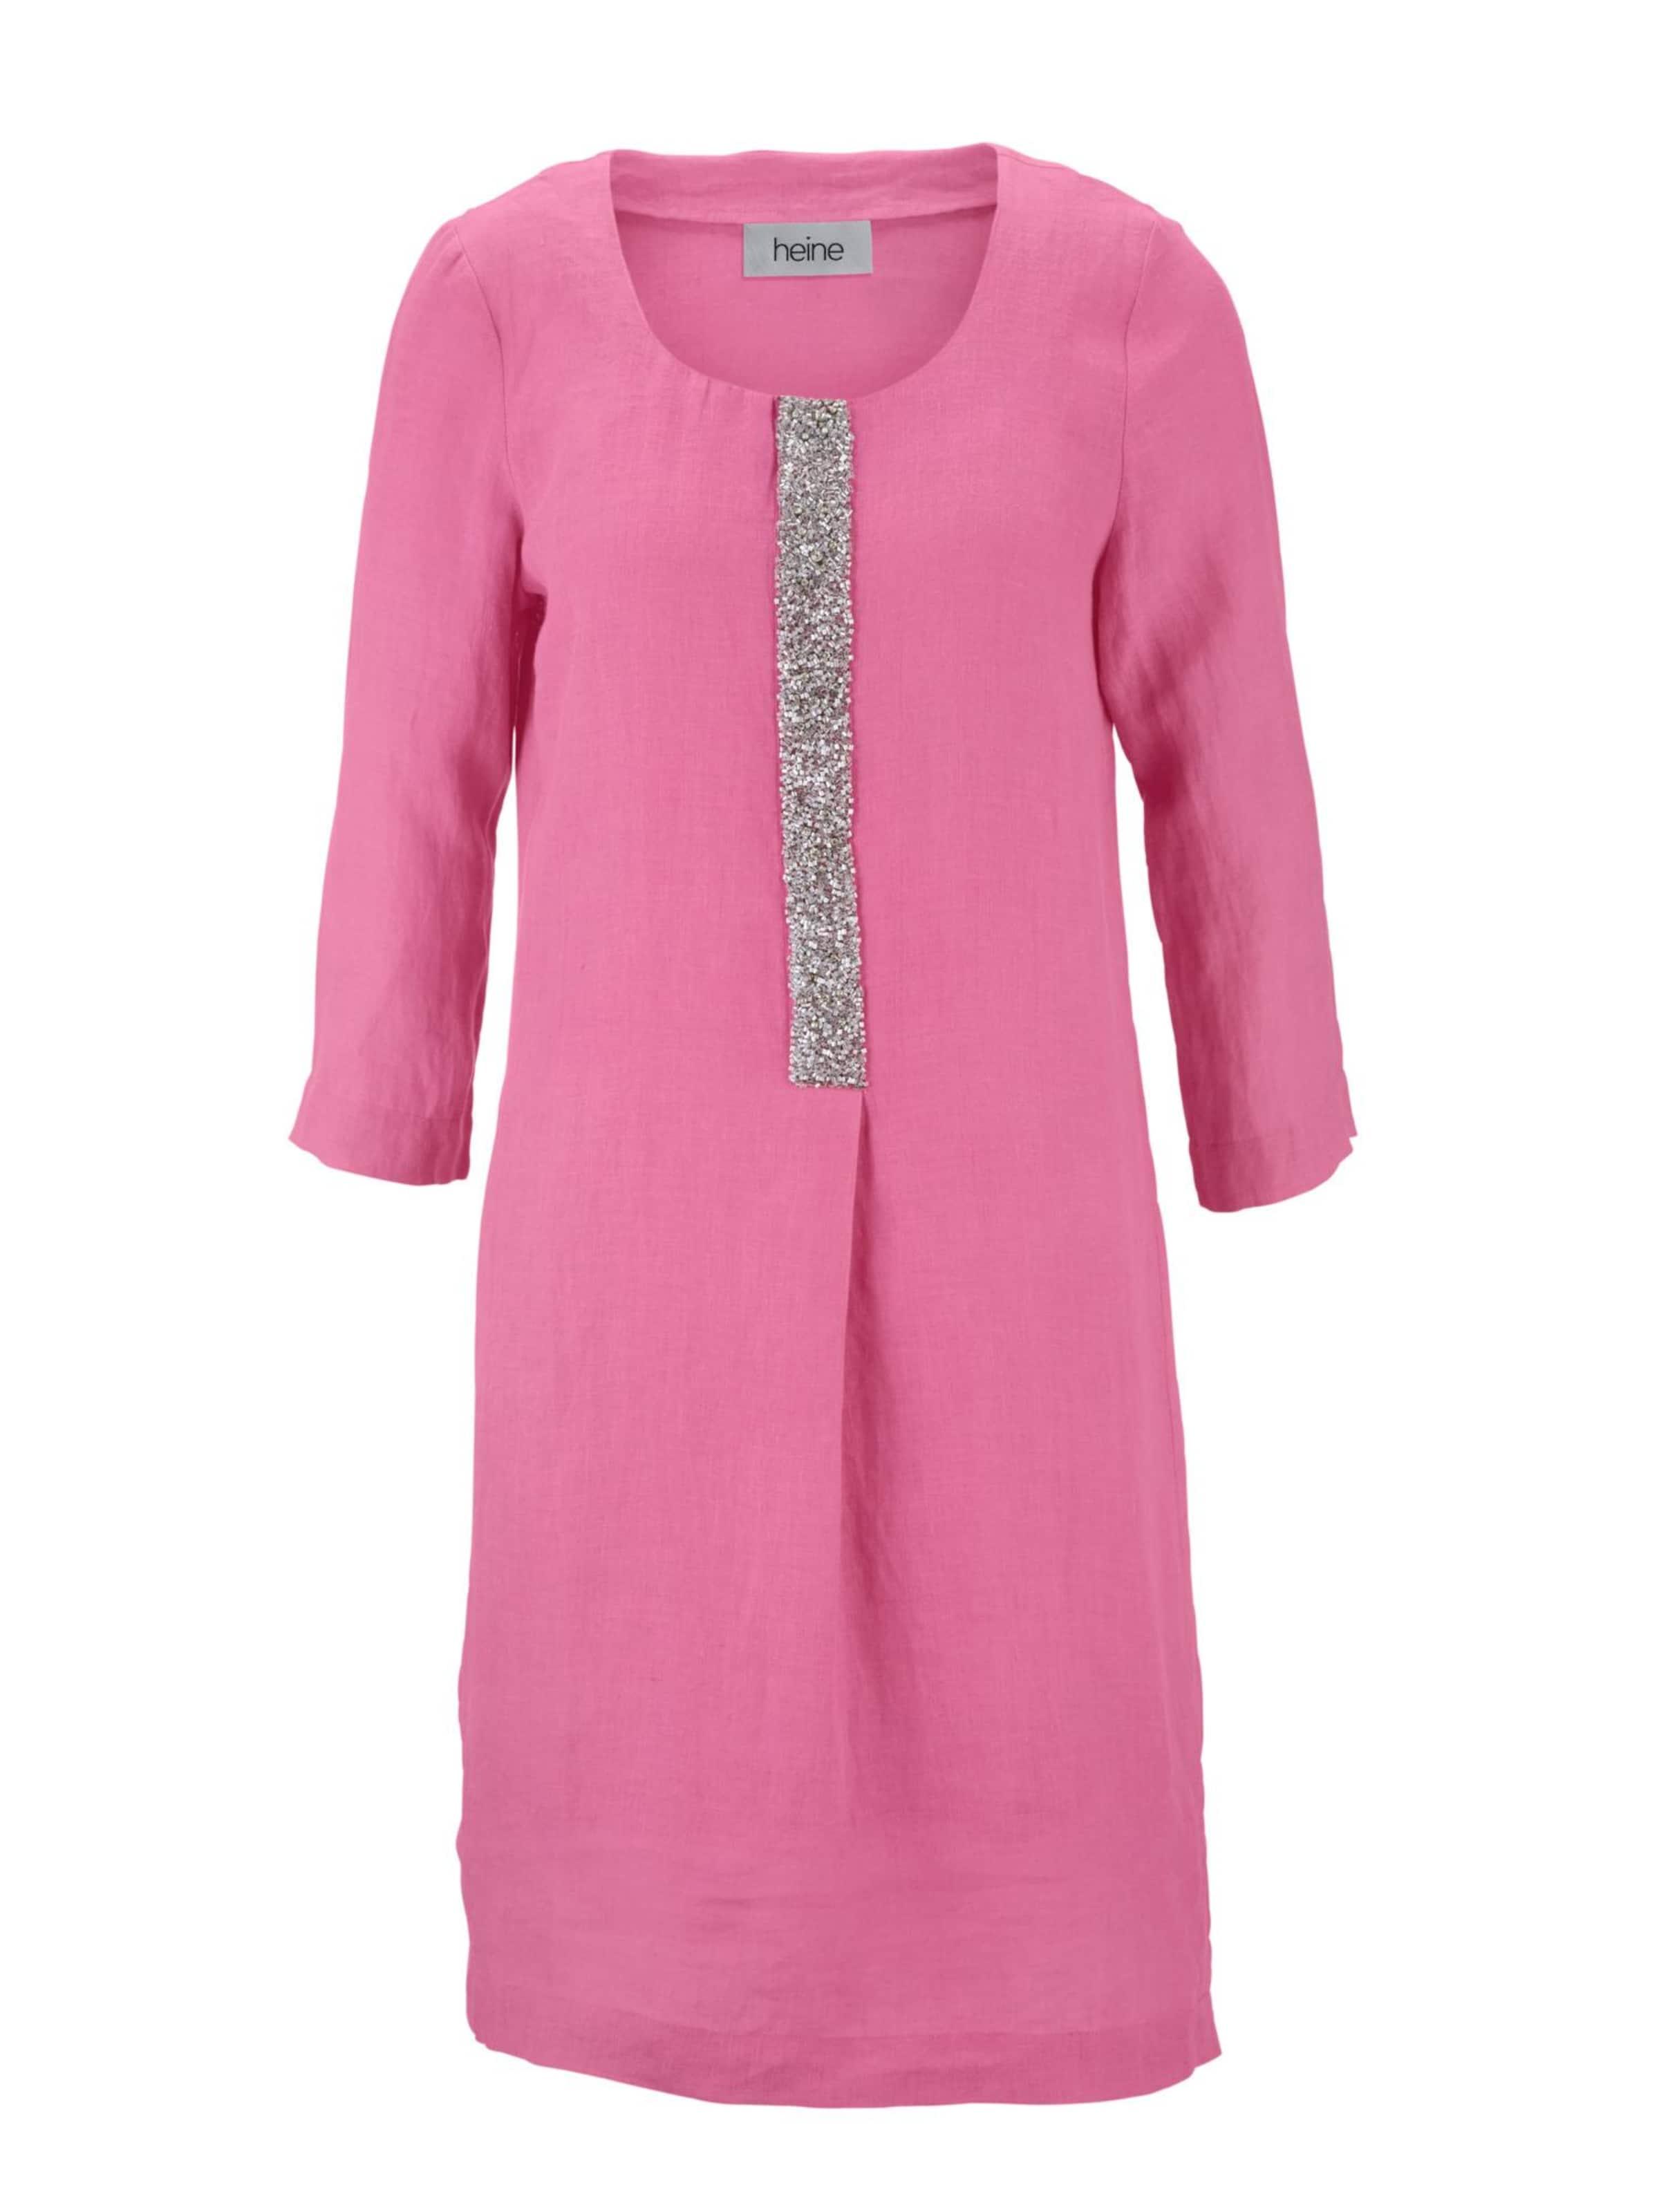 In Heine Kleid Heine Heine In Pink Kleid Pink OXwiTkZPu